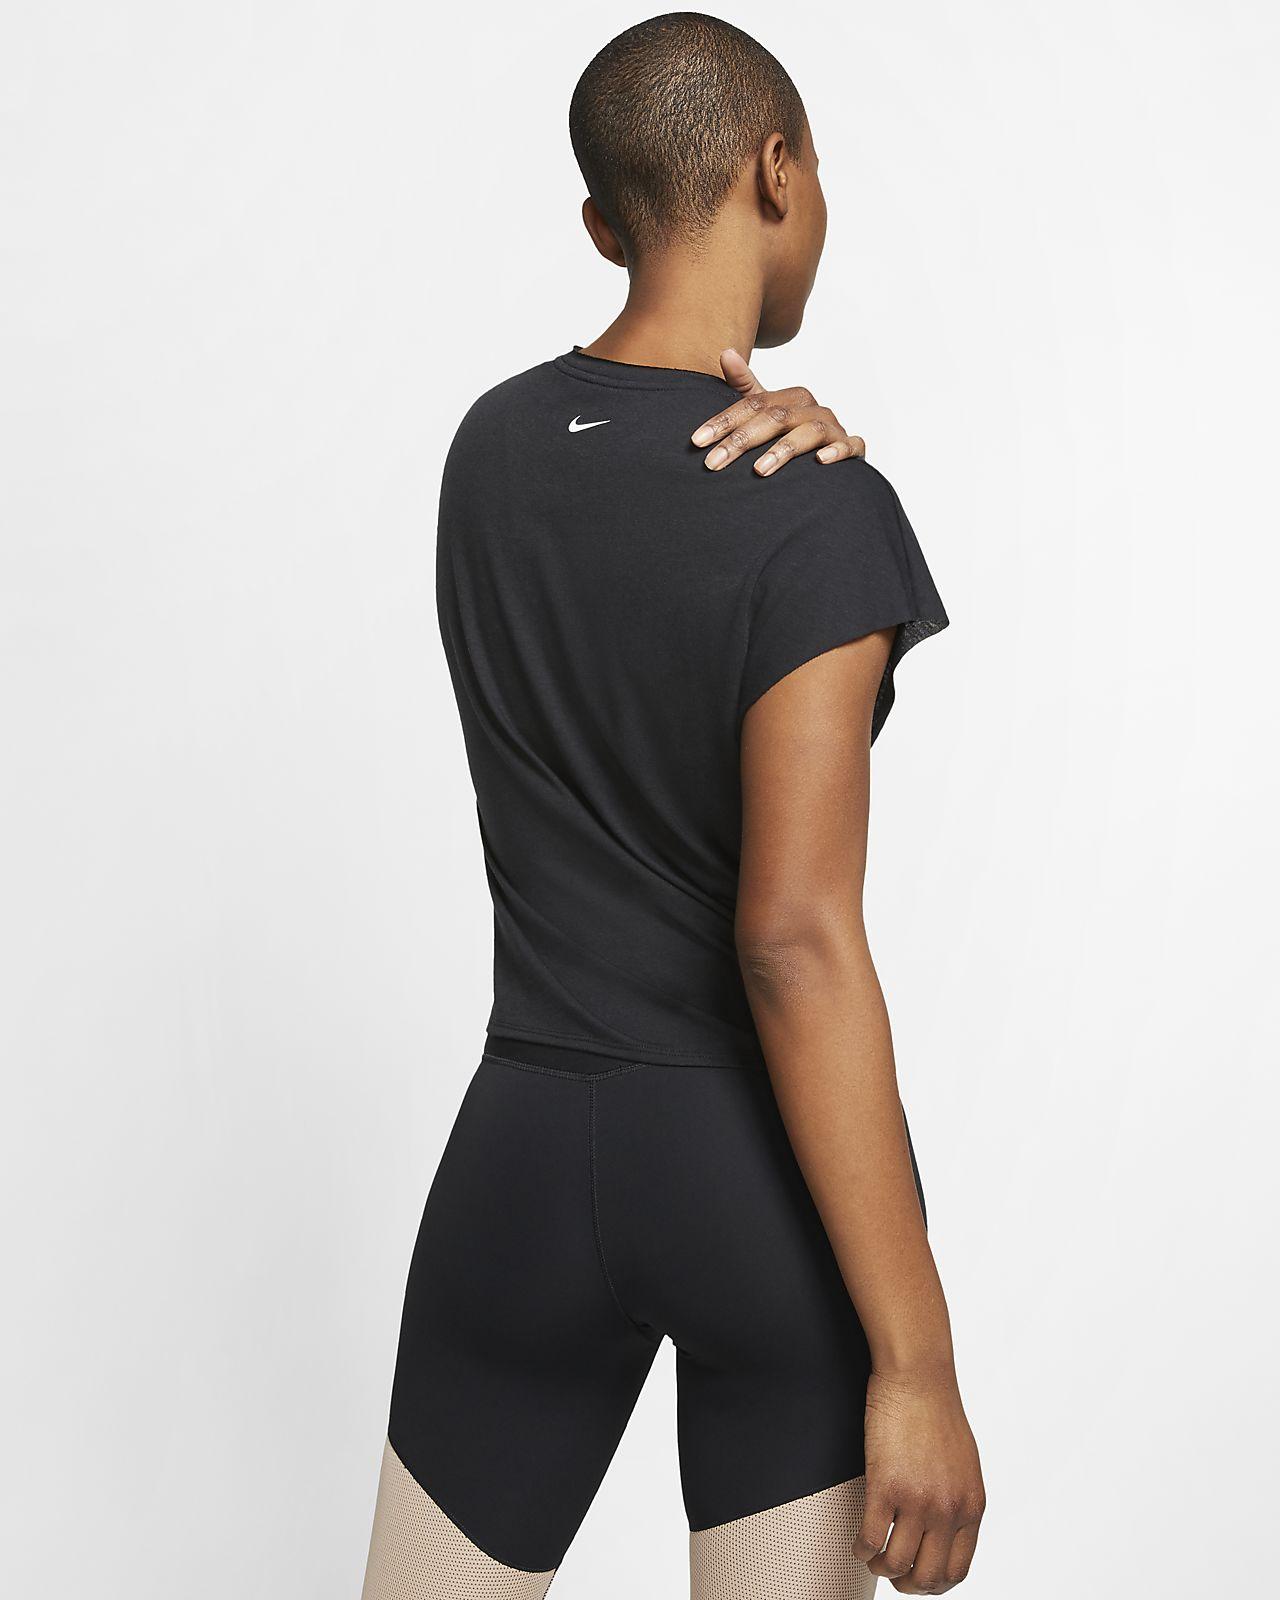 Camiseta Nike Fit Entrenamiento Corta De Manga Mujer Dri dQCxtsrh